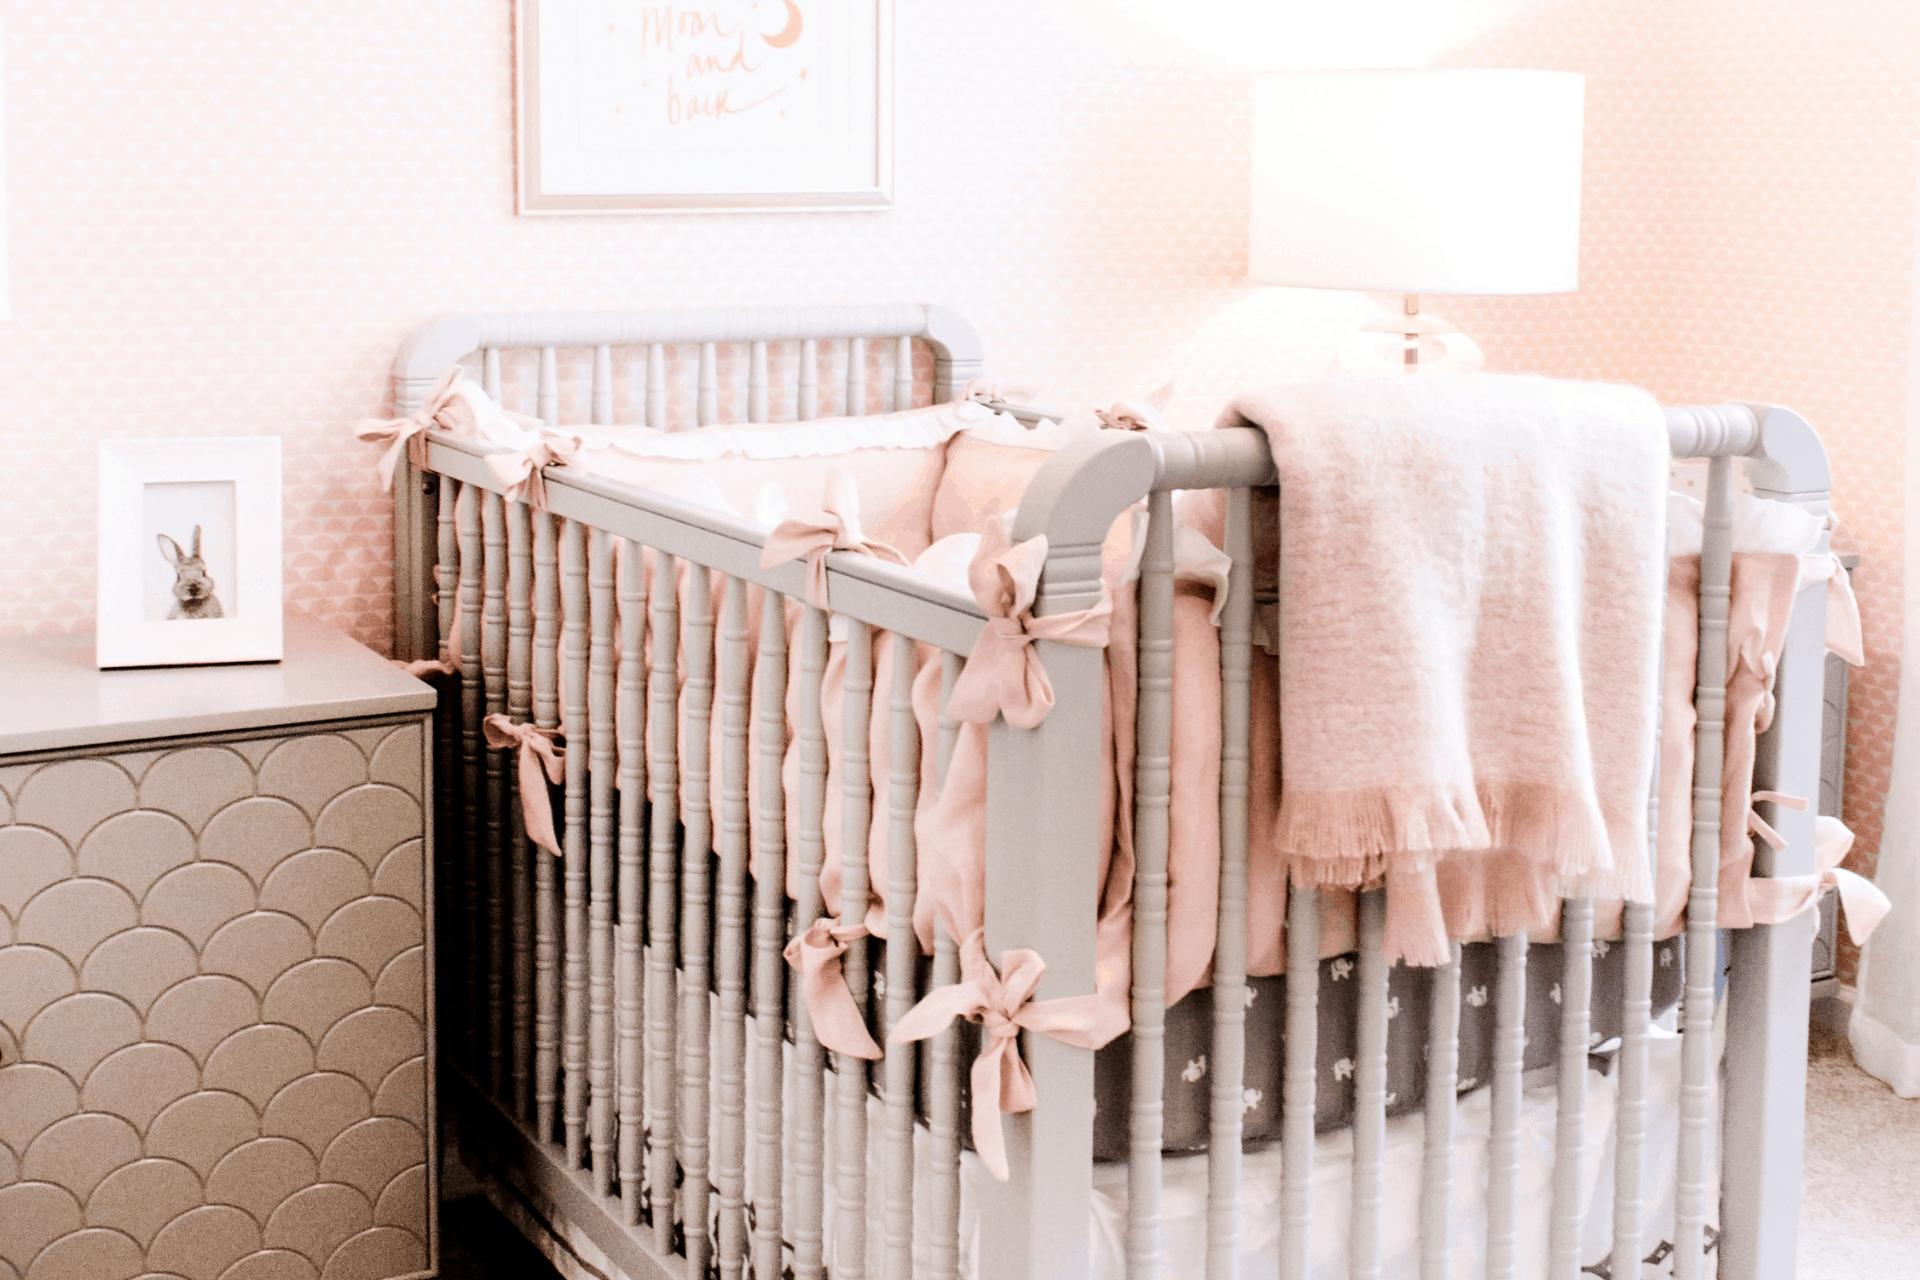 baby crib in a nursery